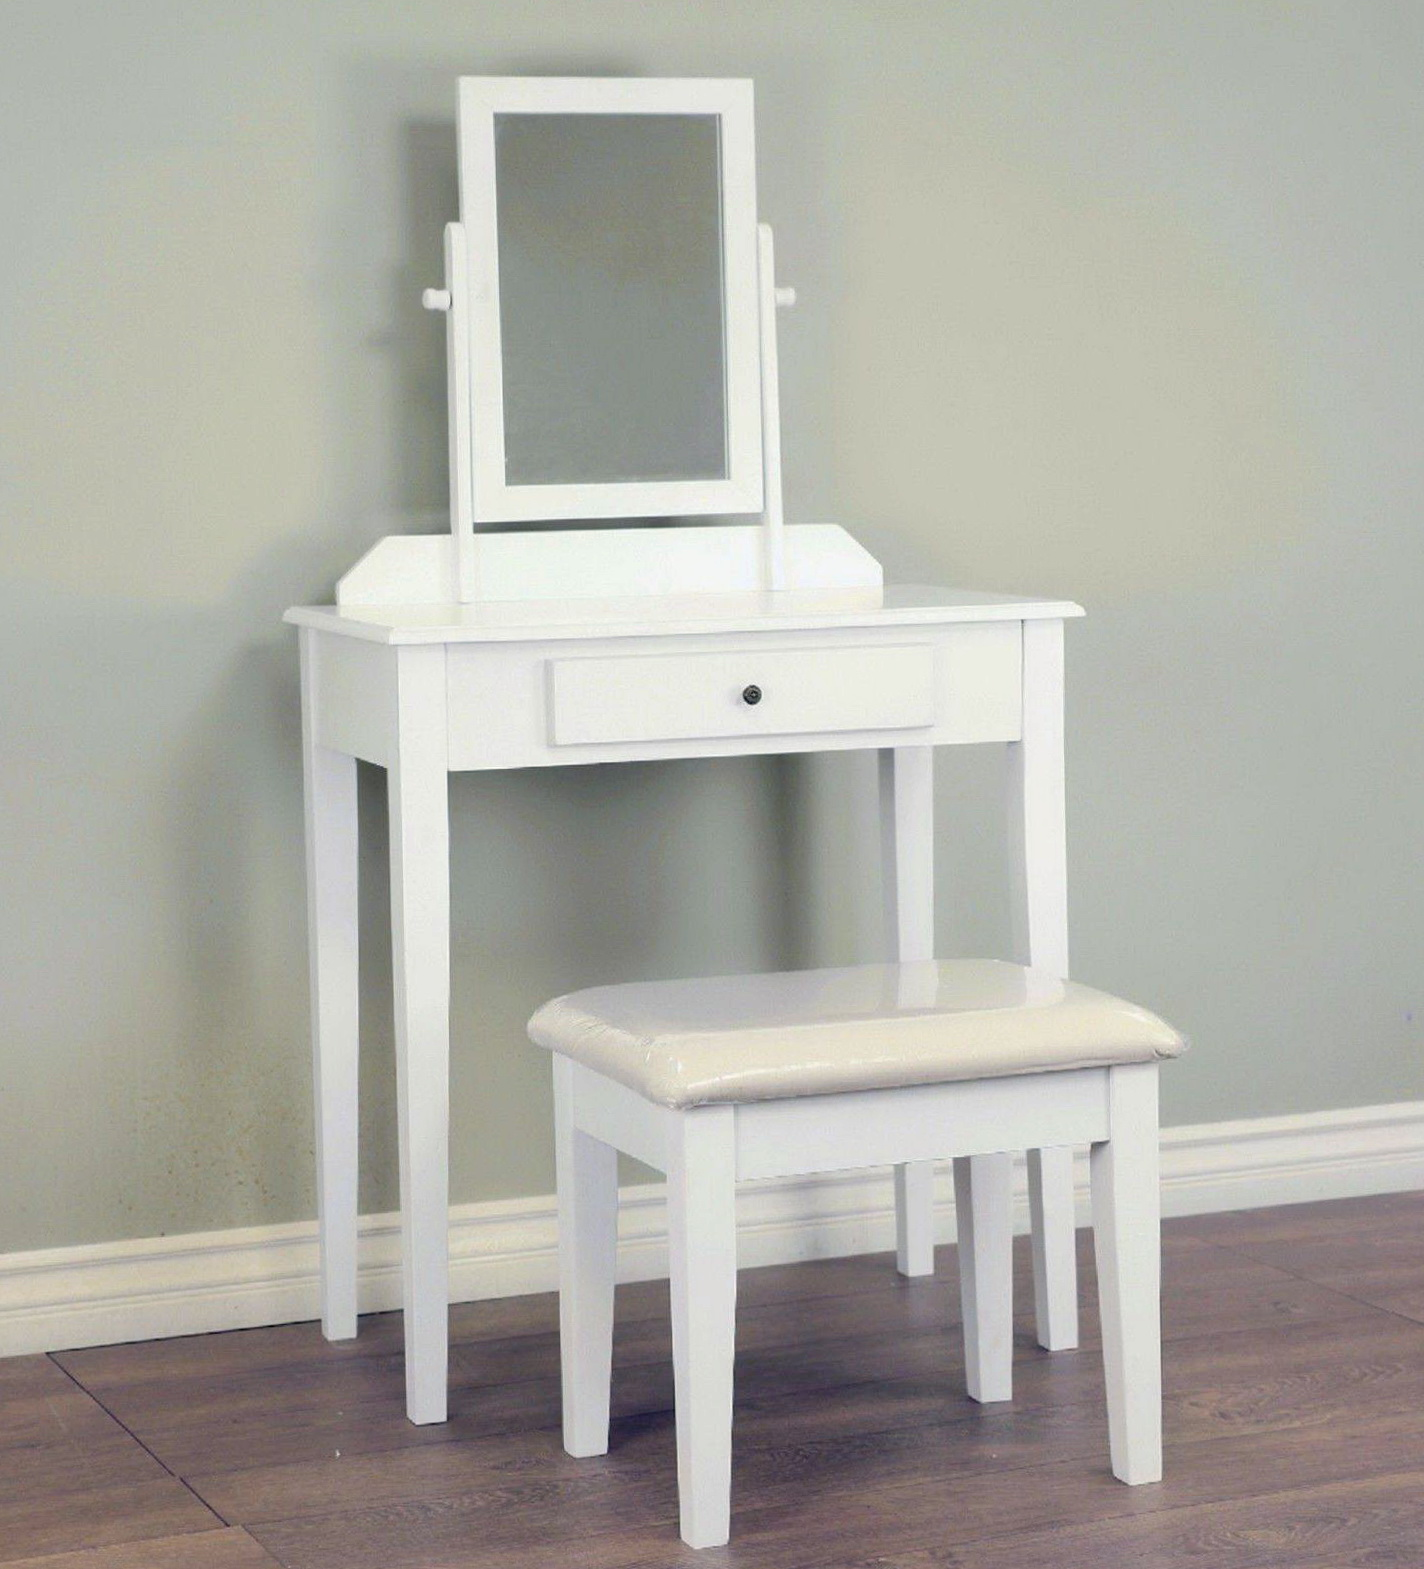 Small White Vanity Desk